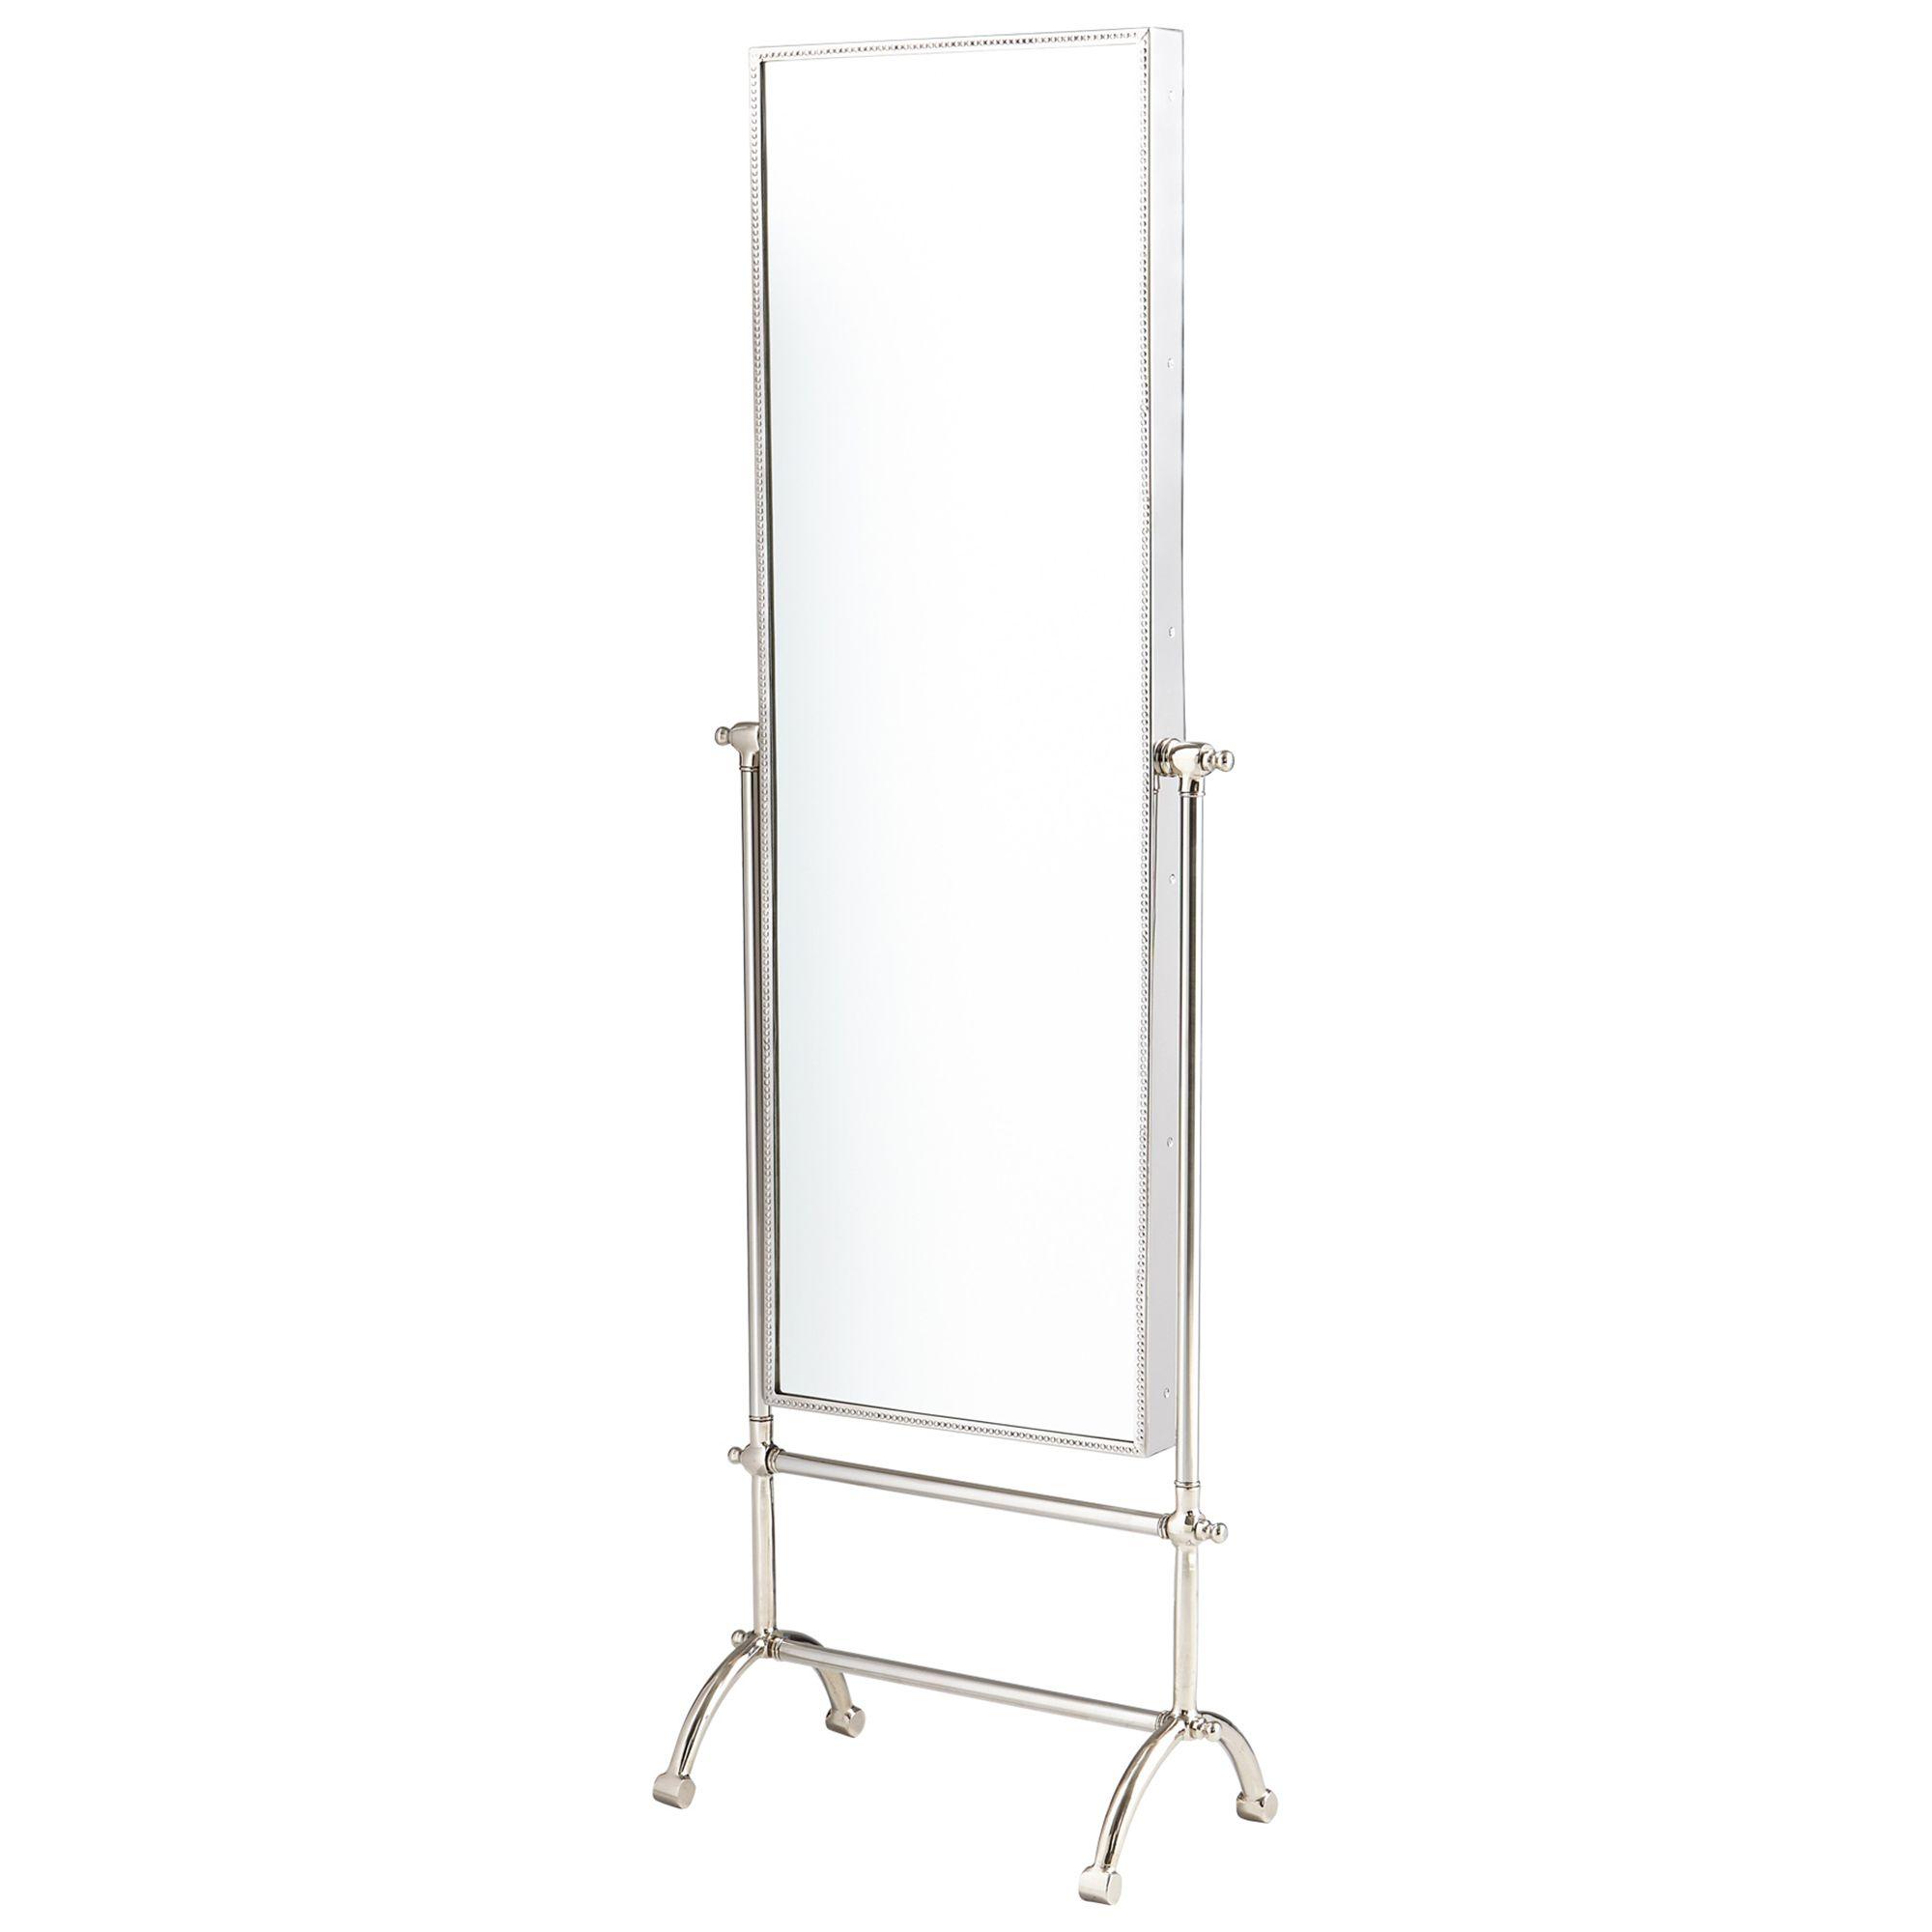 Cassus Dressing Mirror Moss Manor Dressing Mirror Rectangular Mirror Cyan Design